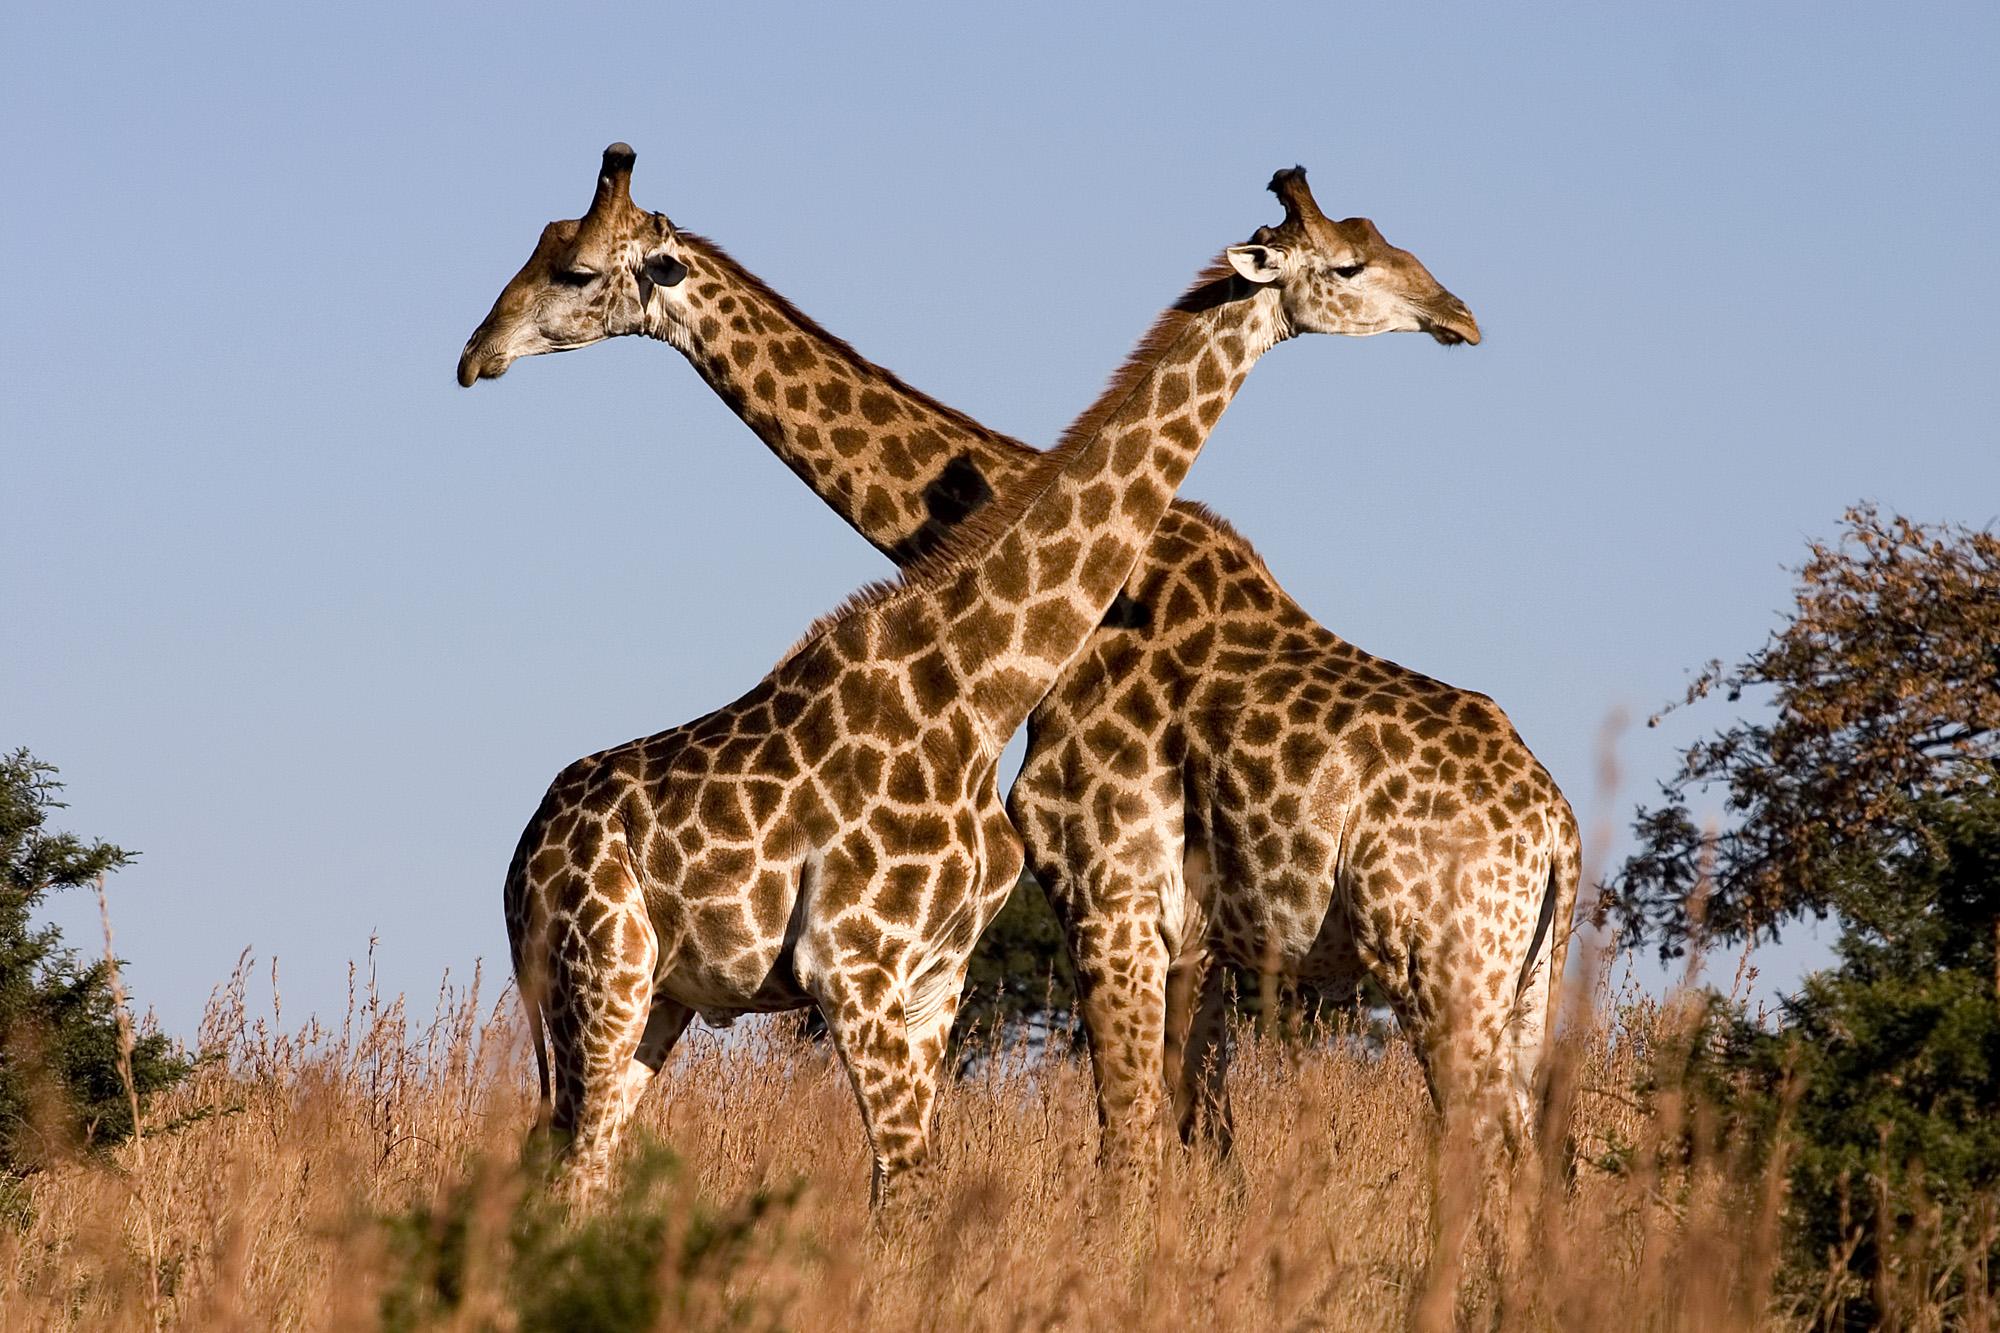 Fighting giraffes in Ithala Game Reserve, northern KwaZulu-Natal, South Africa. Photo taken on July 6, 2004.